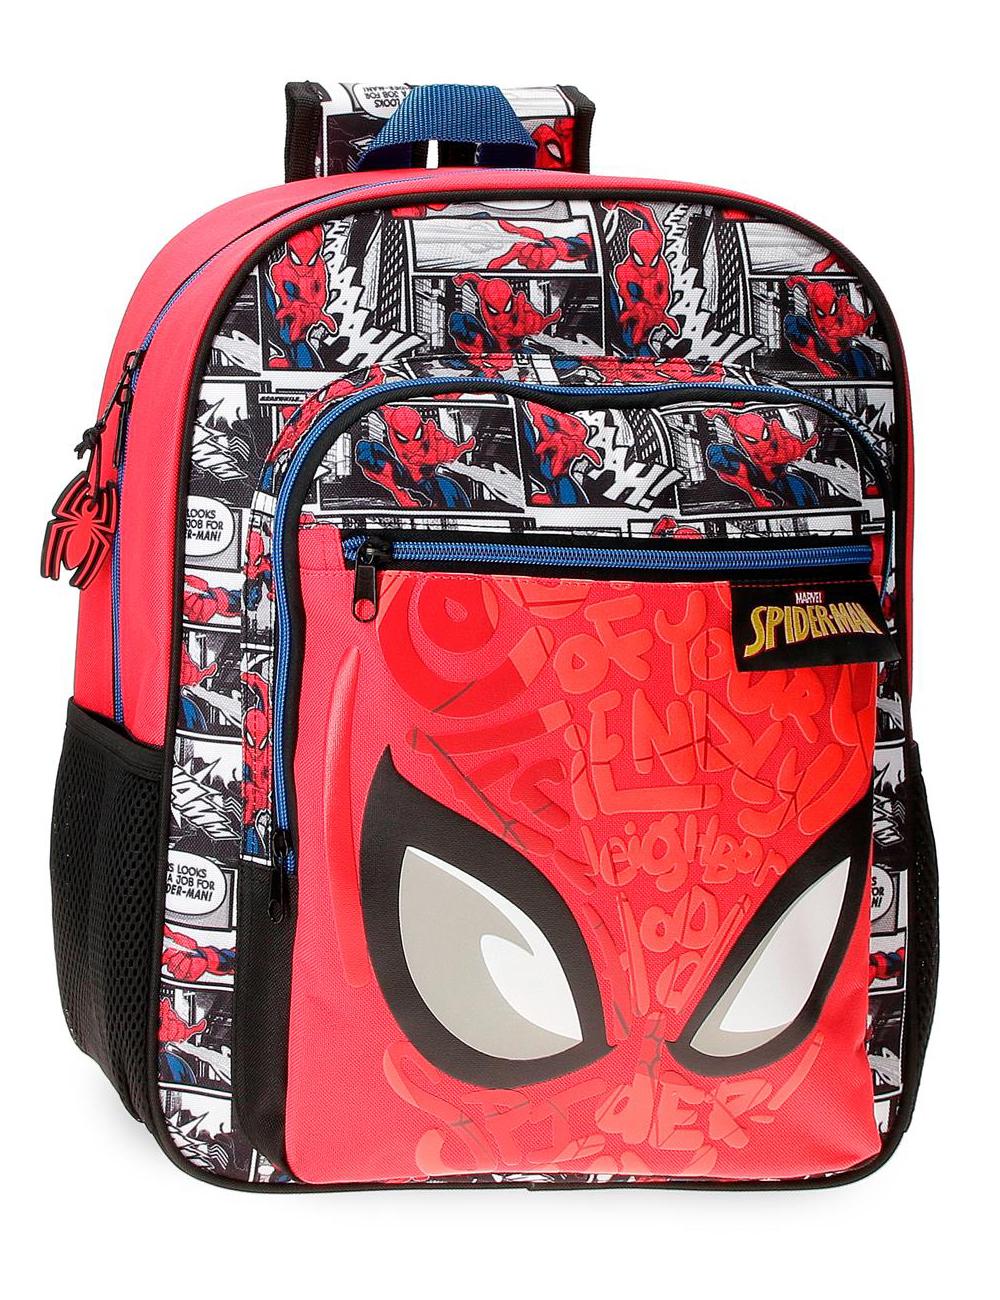 2252321 Mochila 38cm Spiderman Comic